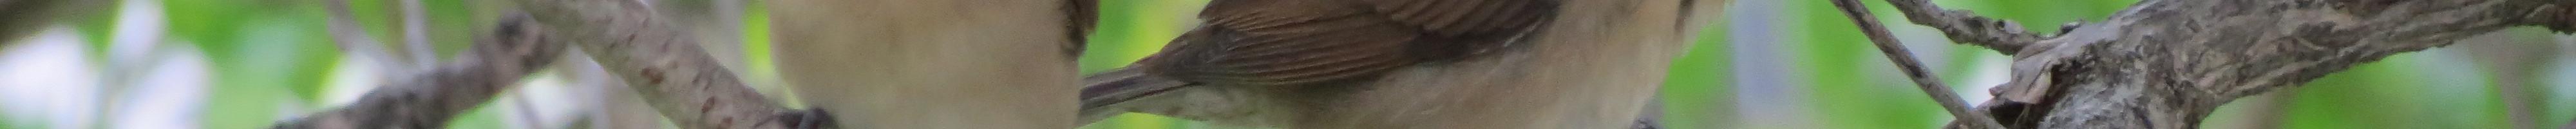 Juvenile Scaly-Breasted Munia (Lonchura punctulata), Bangkok